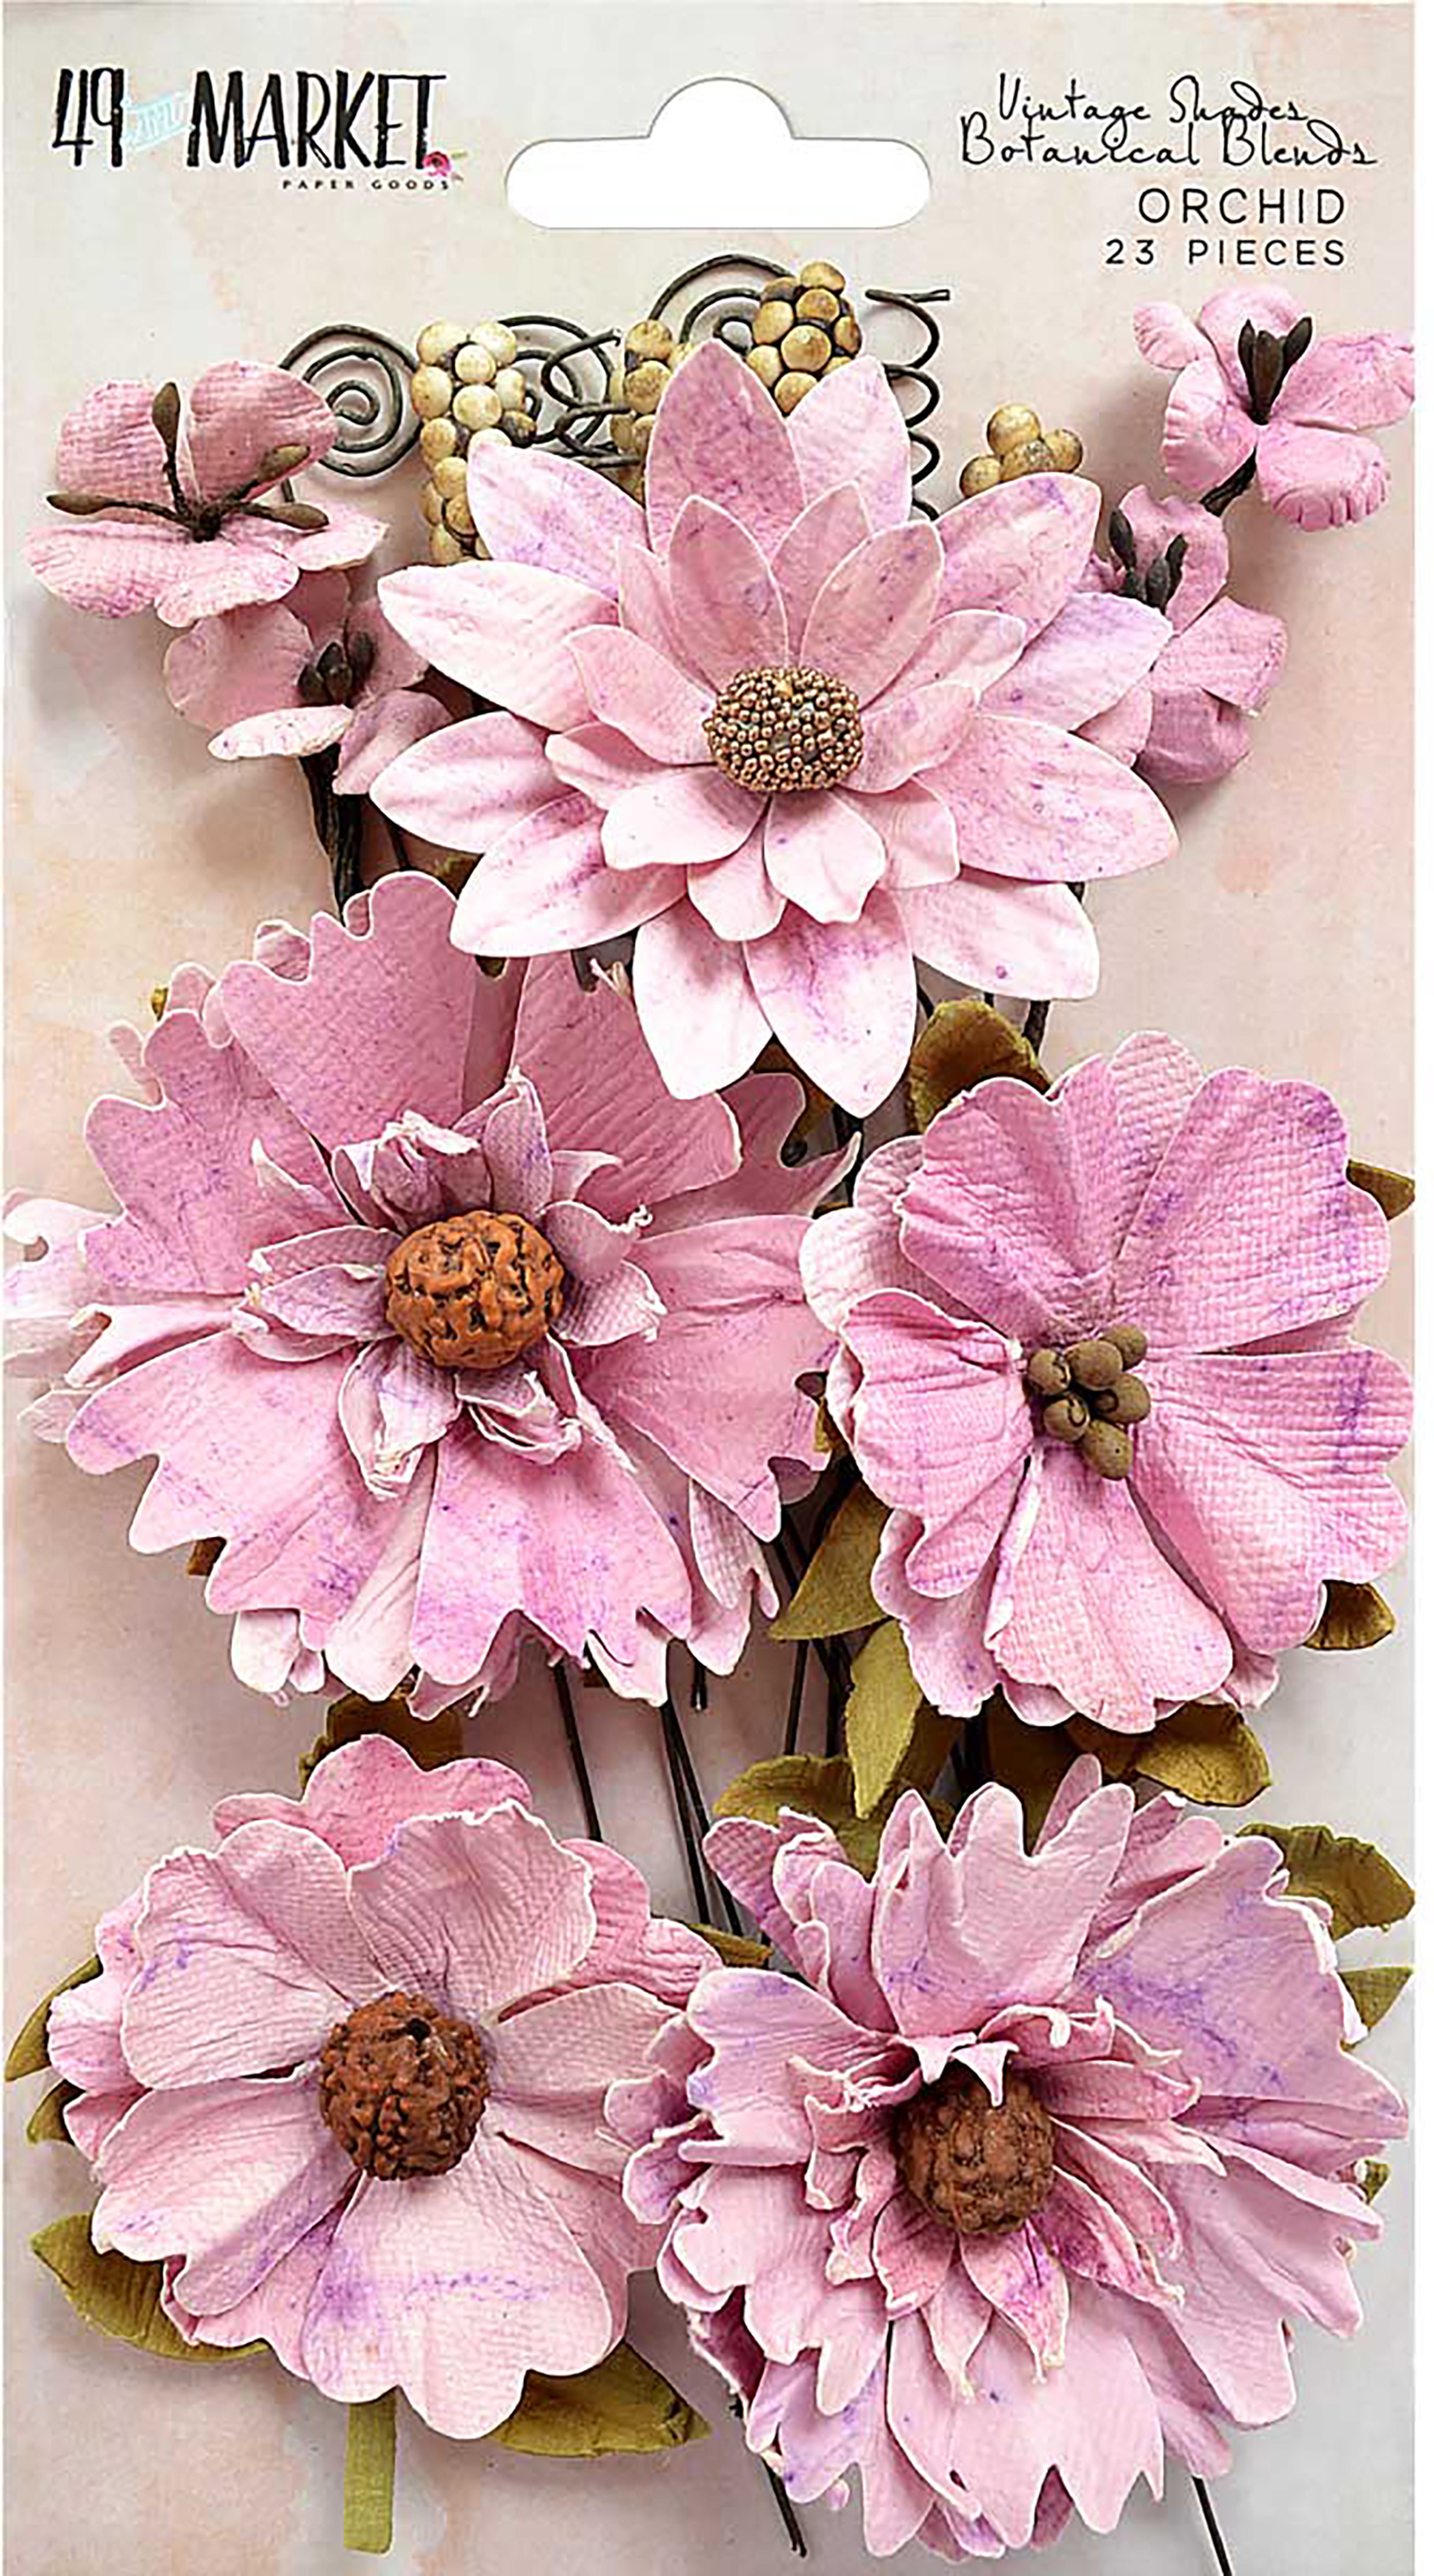 Vintage Shades-Orchid Botanical